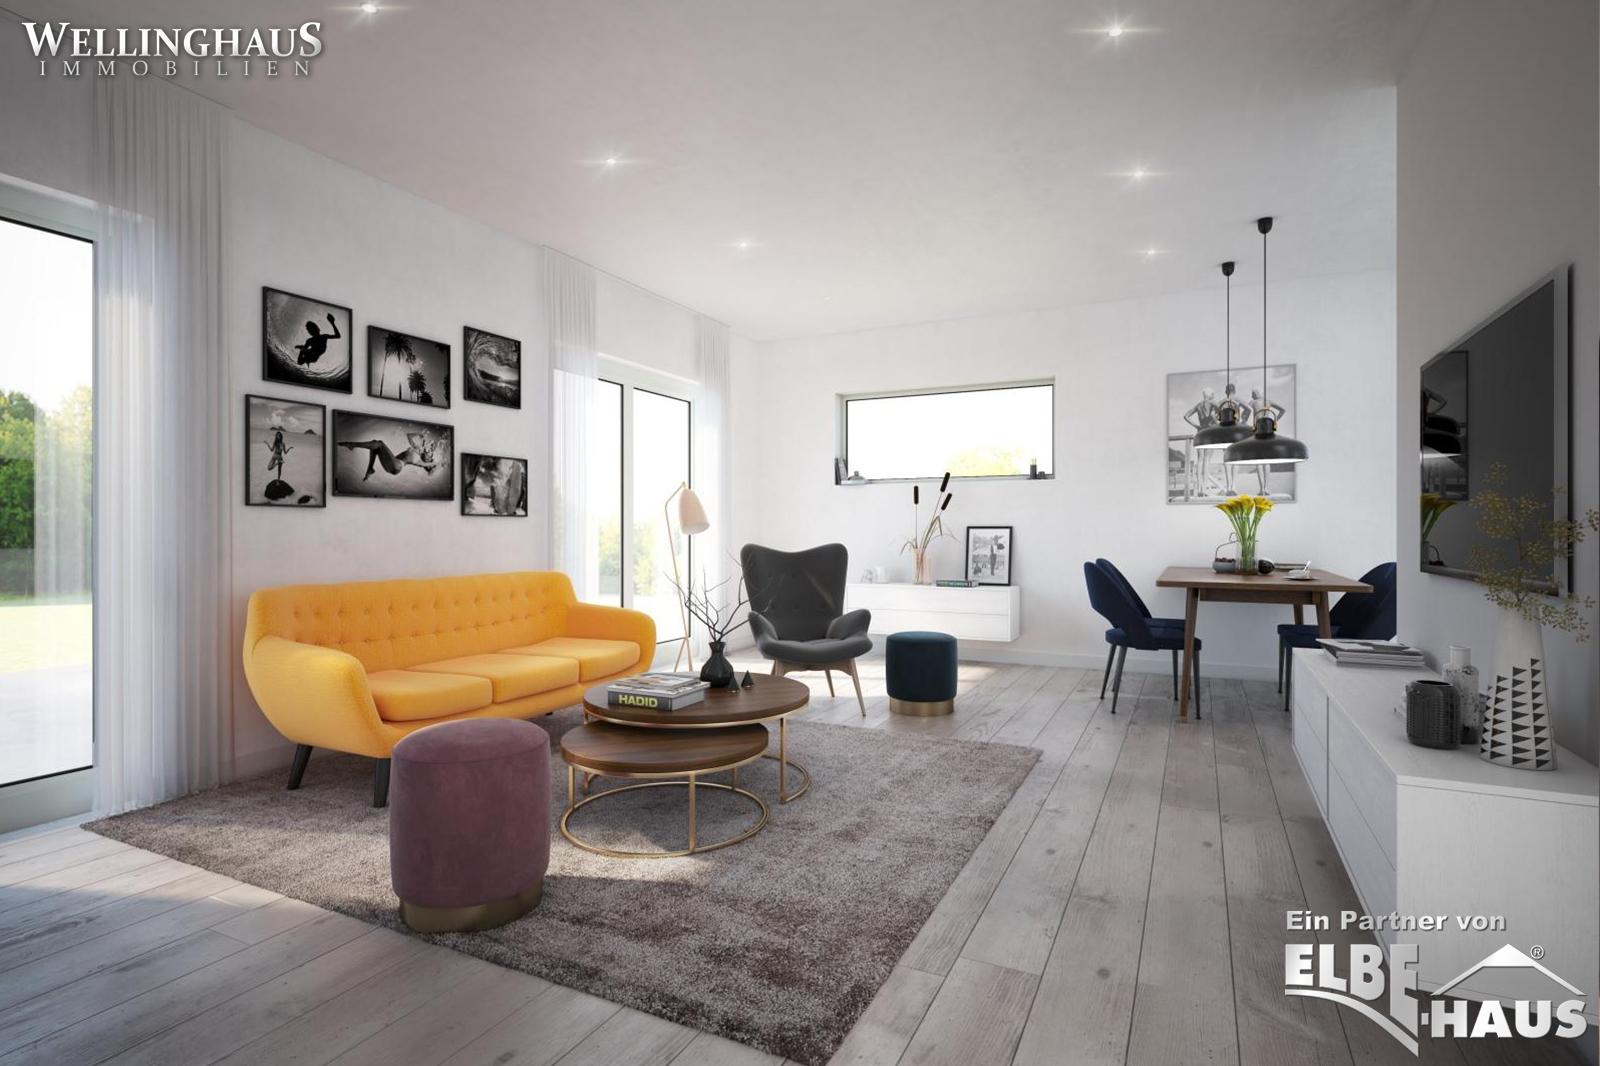 ELBE-Haus Bungalow JL-3-153 Wohnen